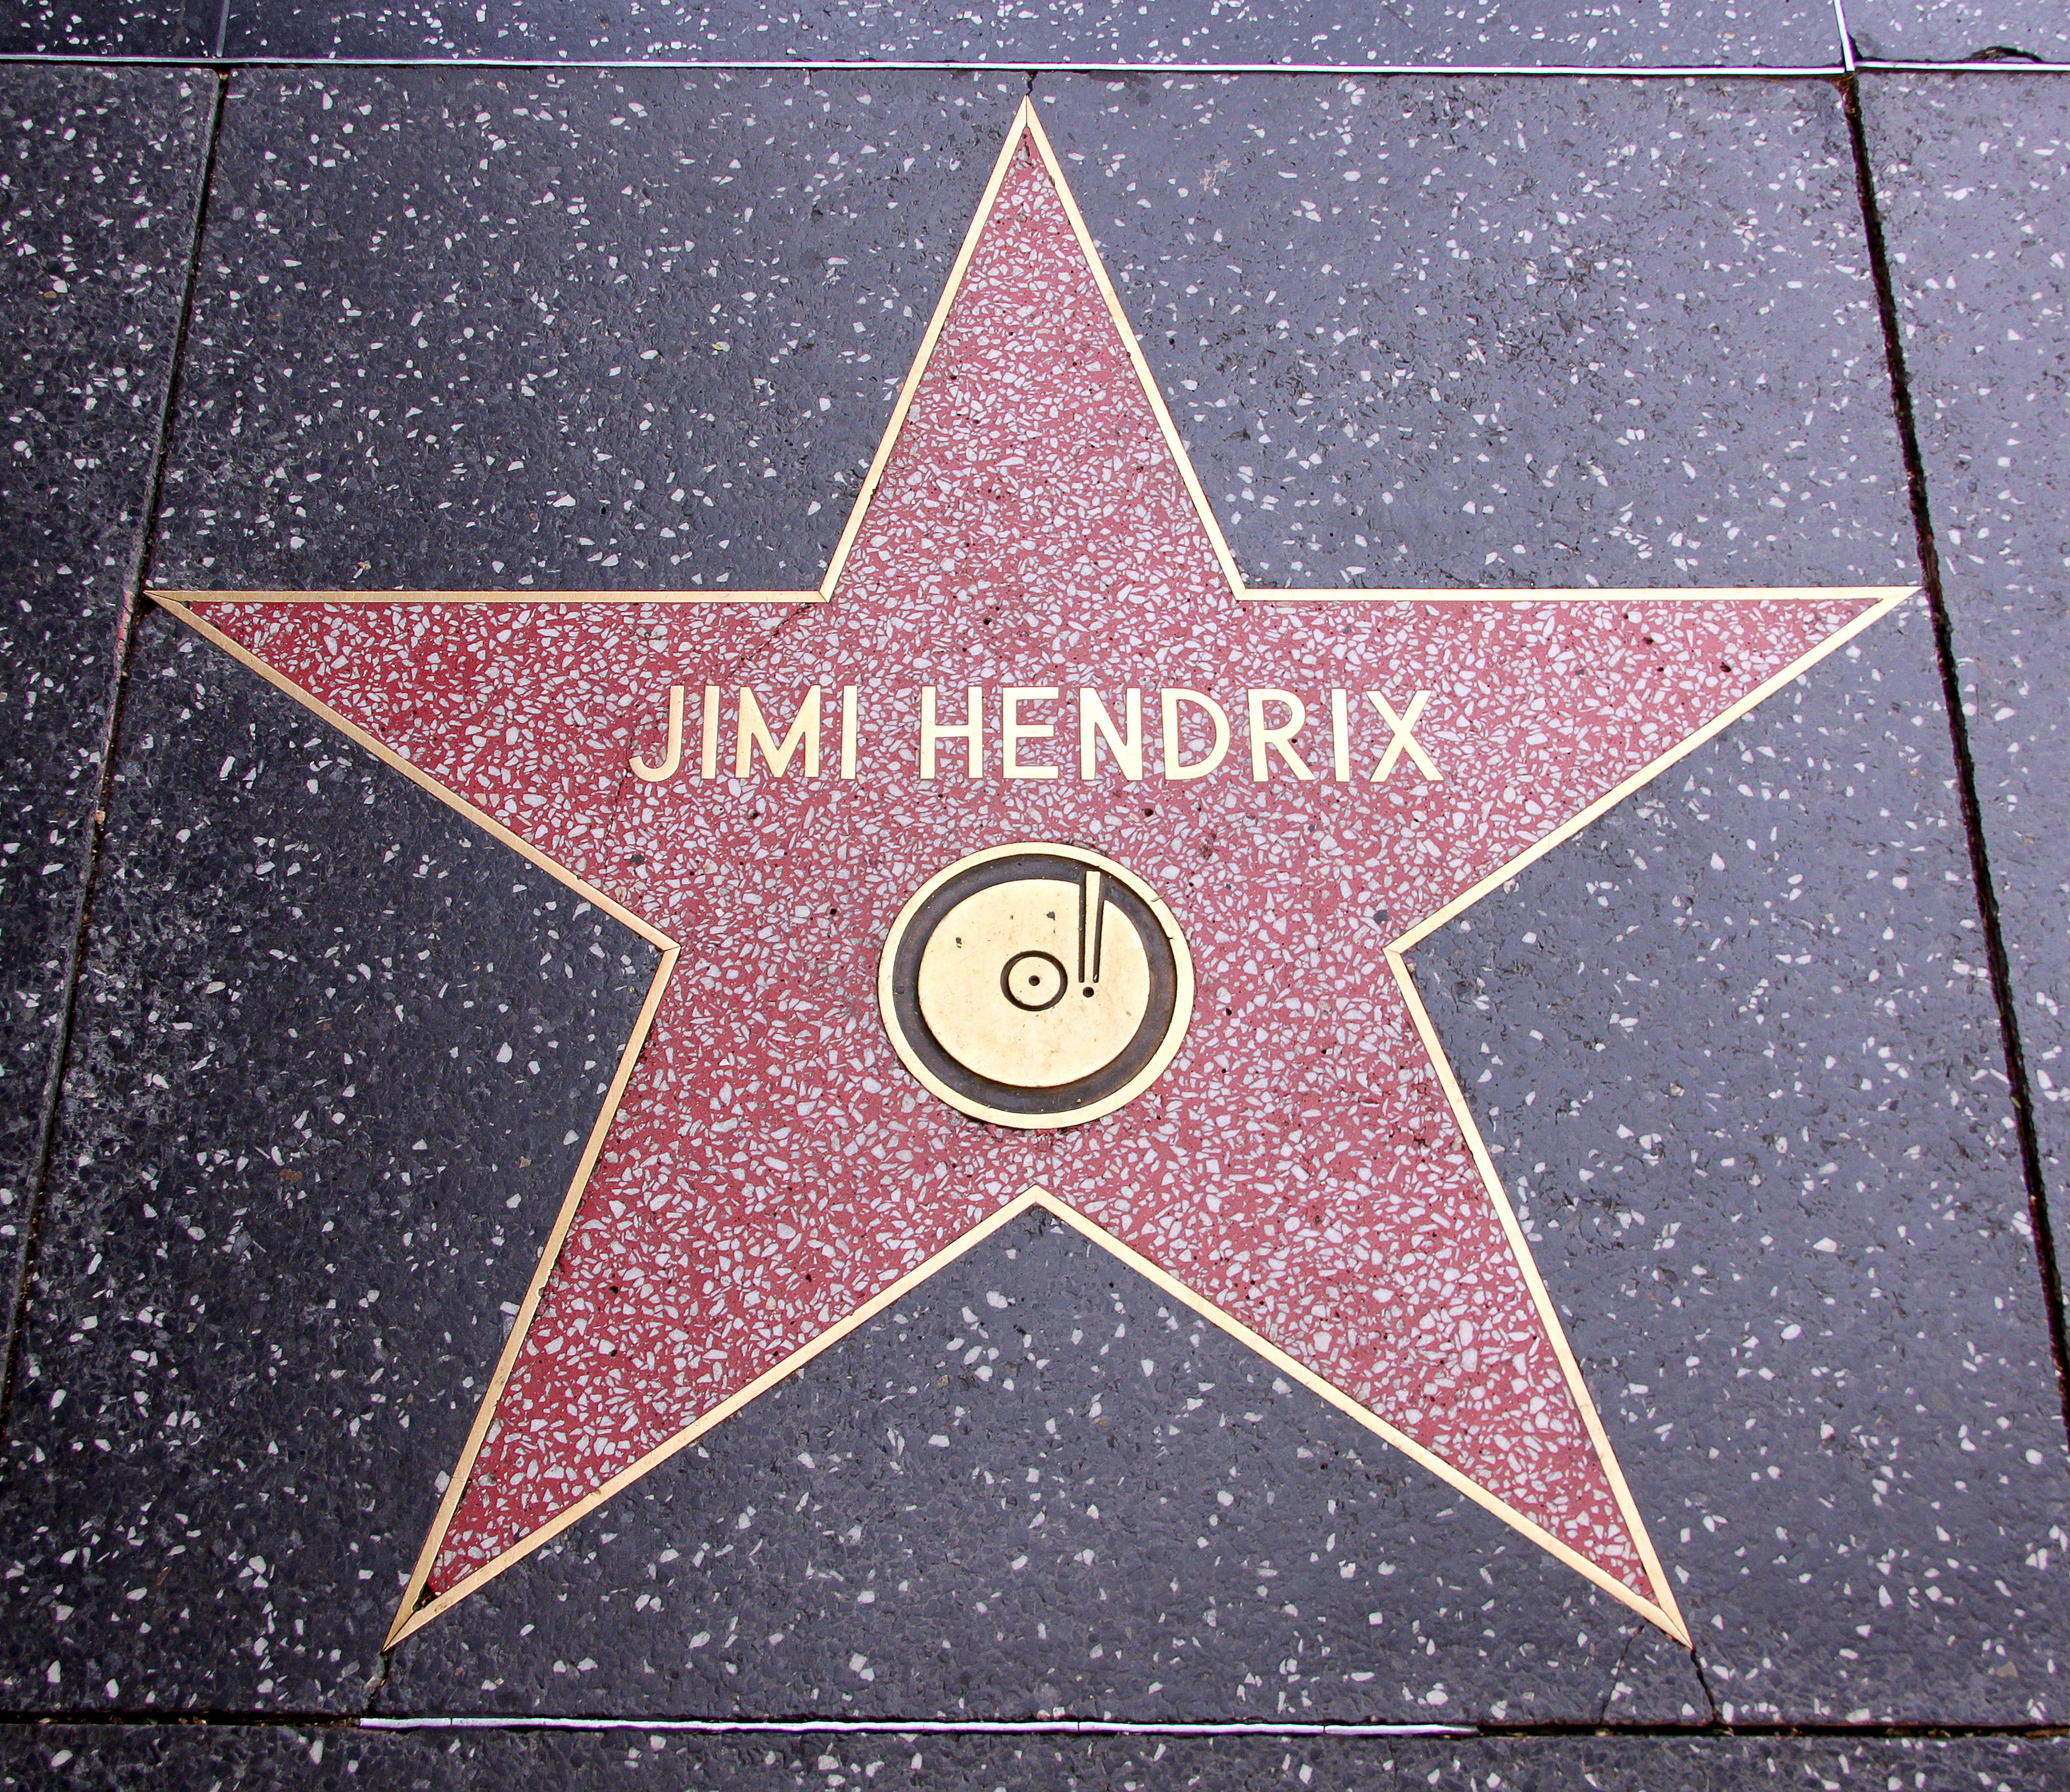 Jimi Hendrix Walk of Fame.jpg